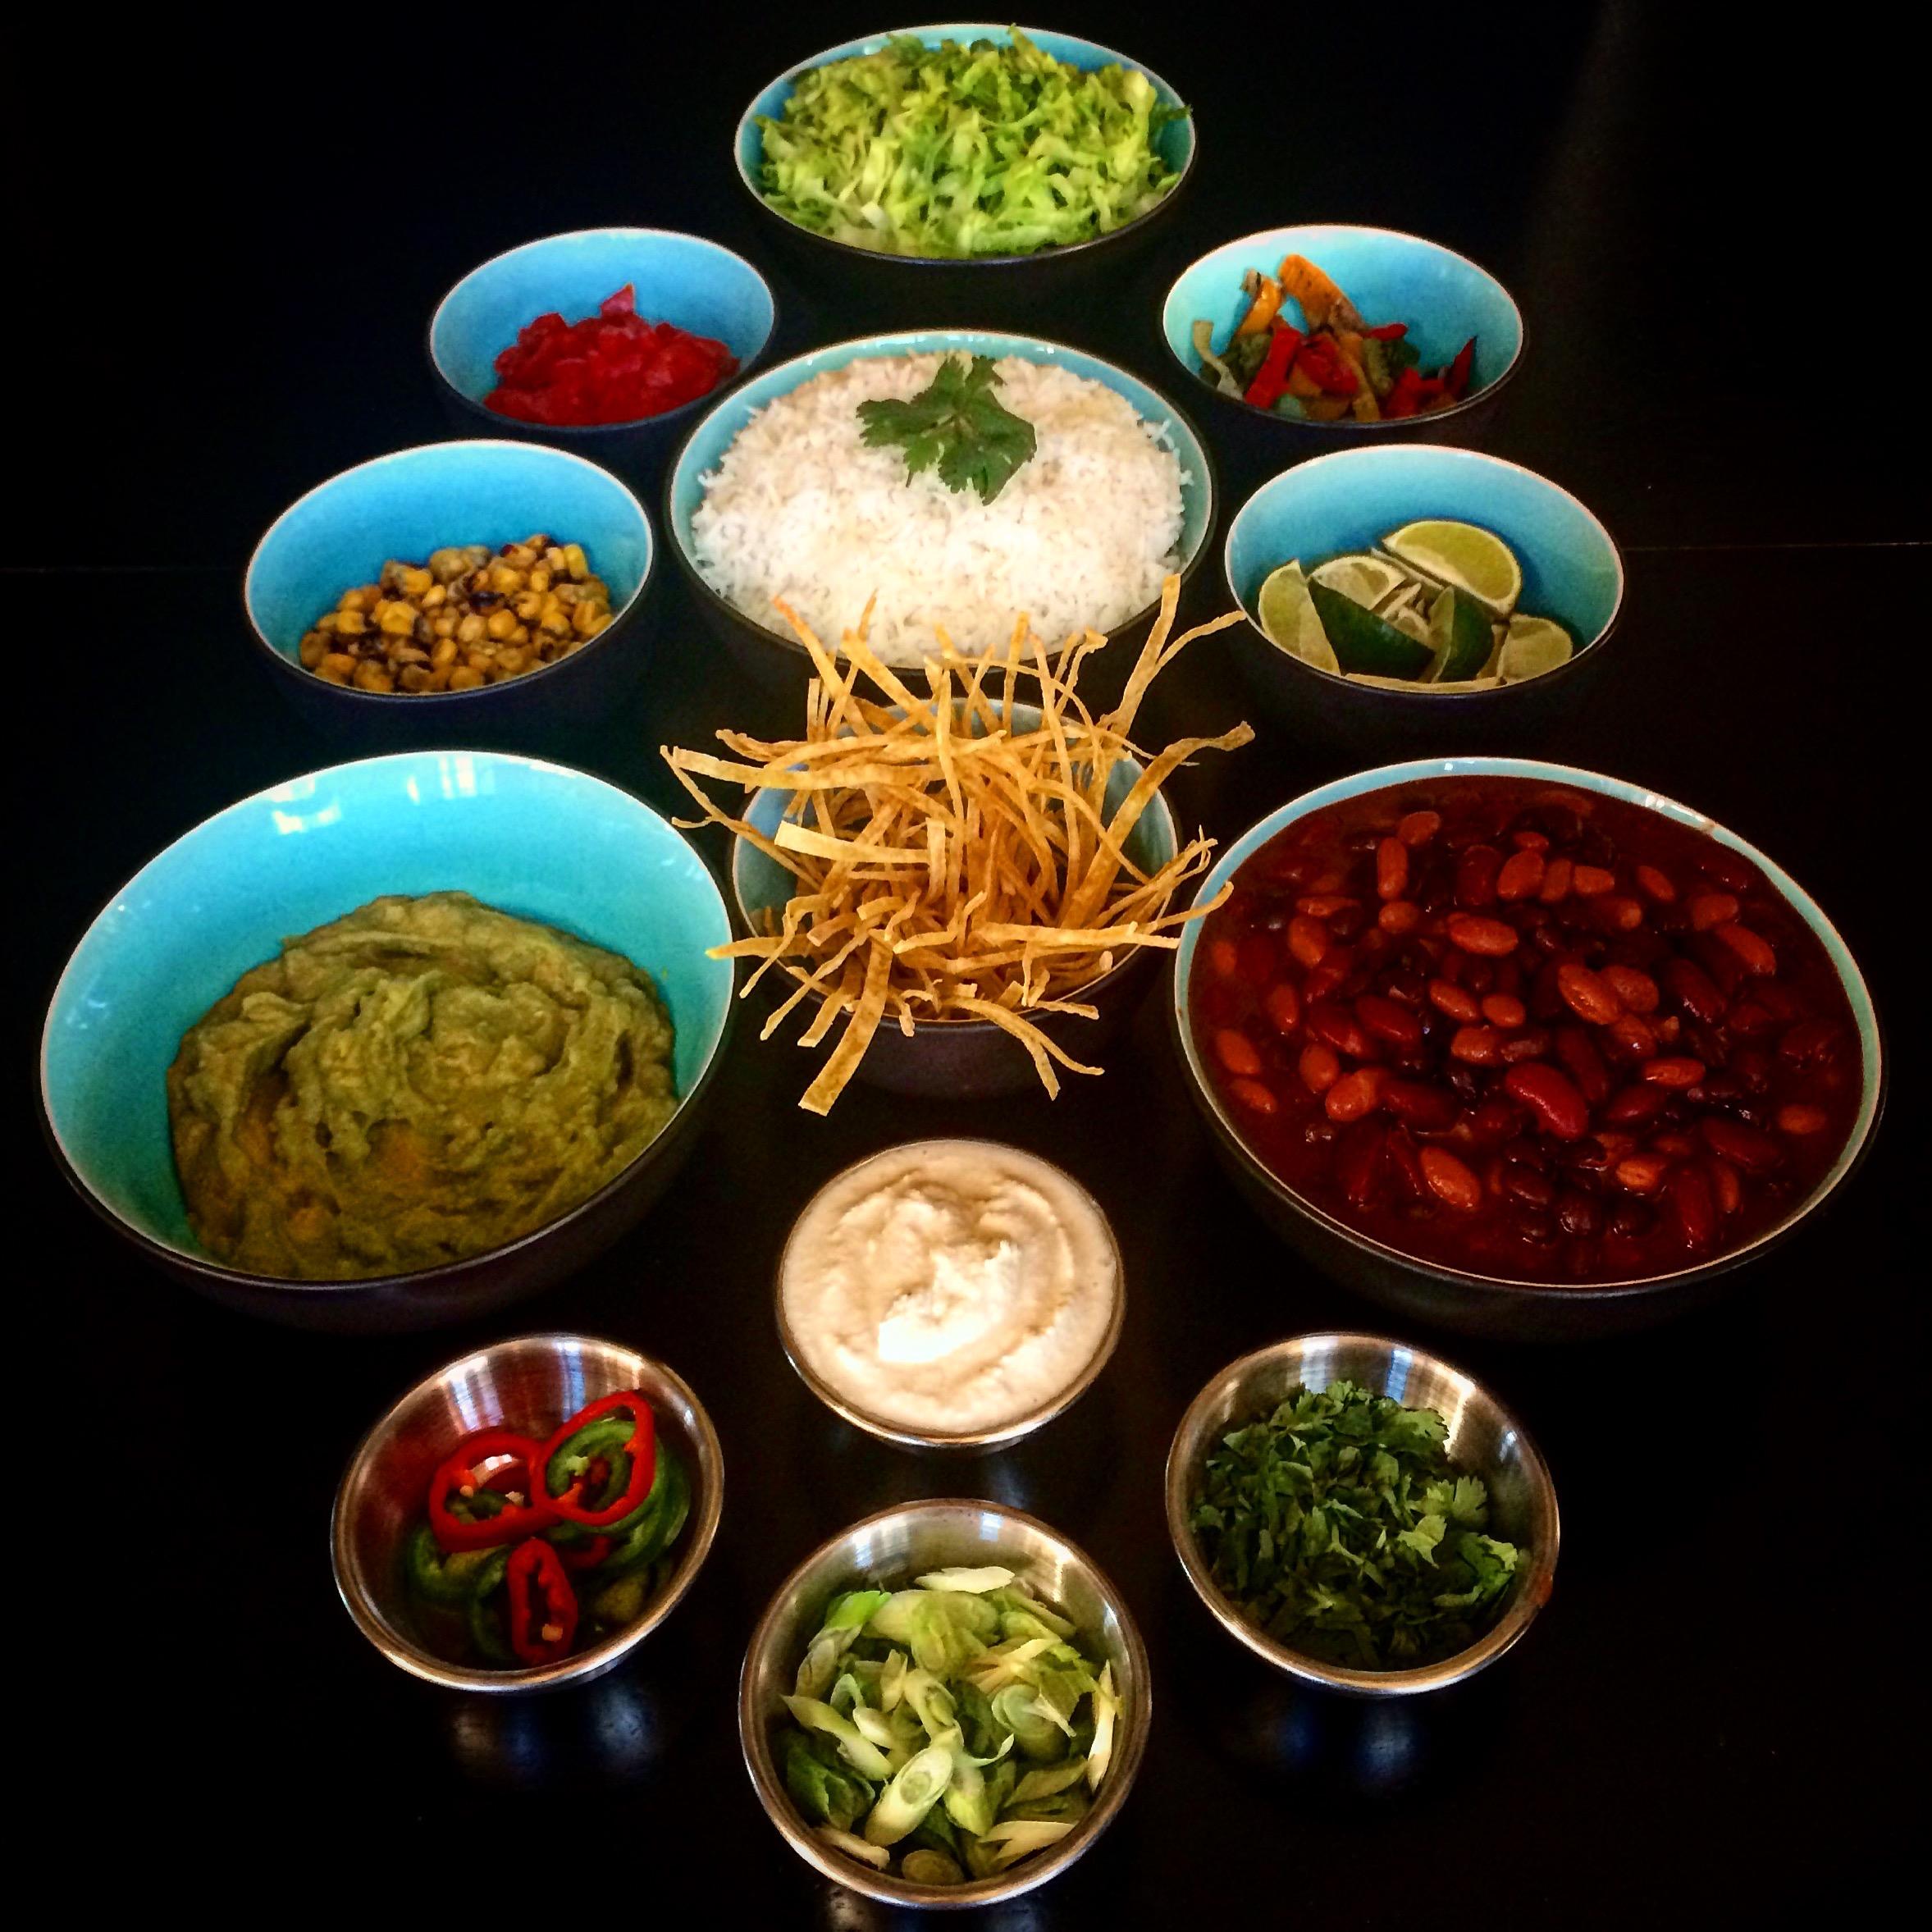 SUPER BOWL EATS: Whole Food, Plant-Based, Oil Free